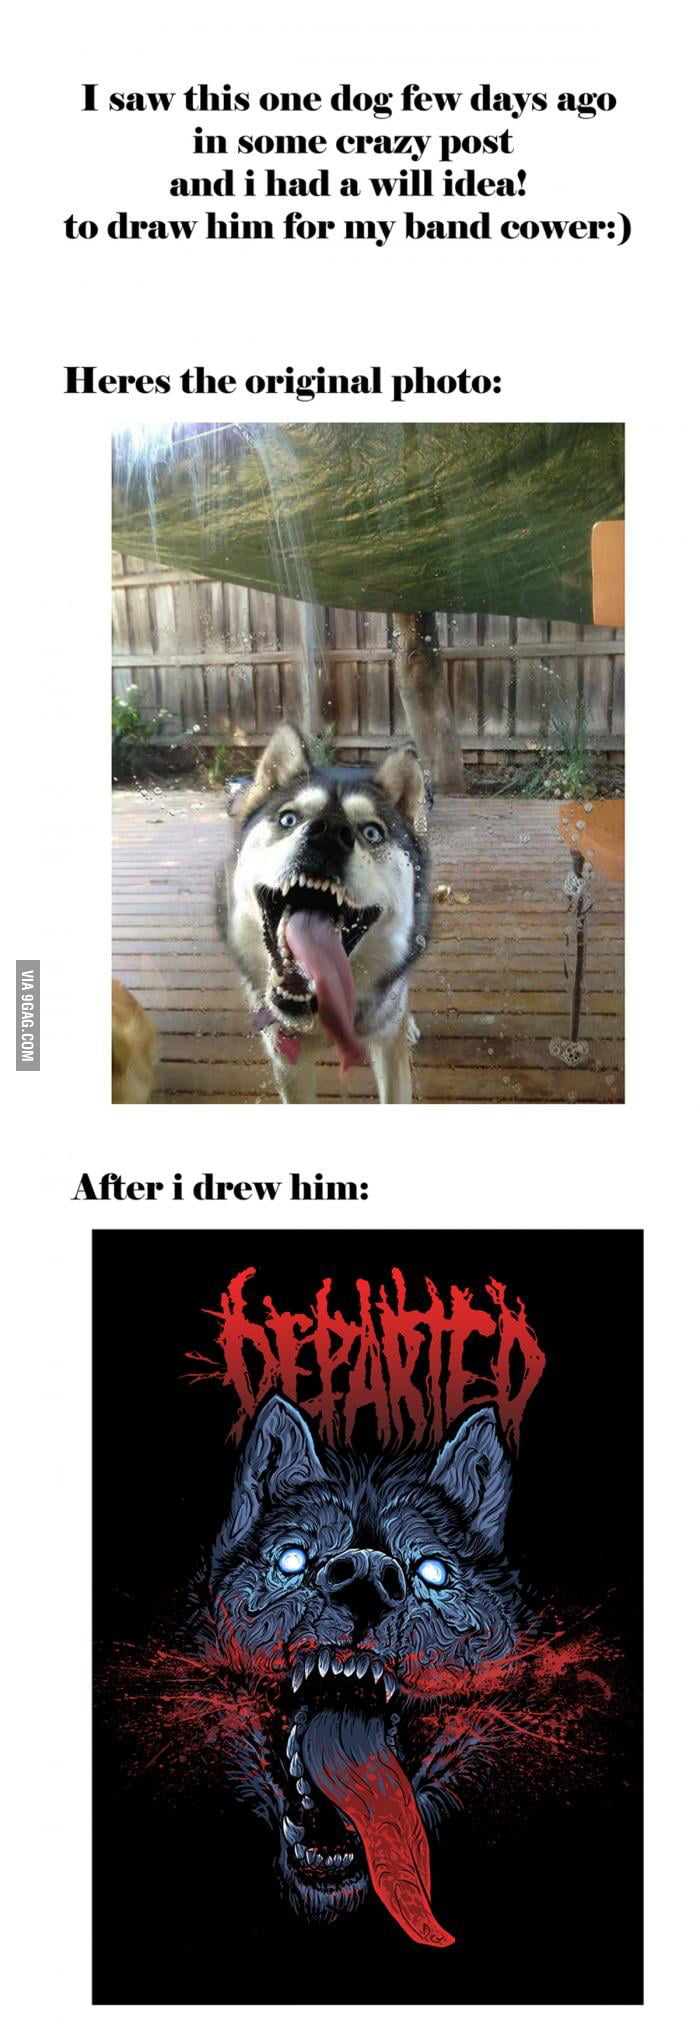 Demon dog!